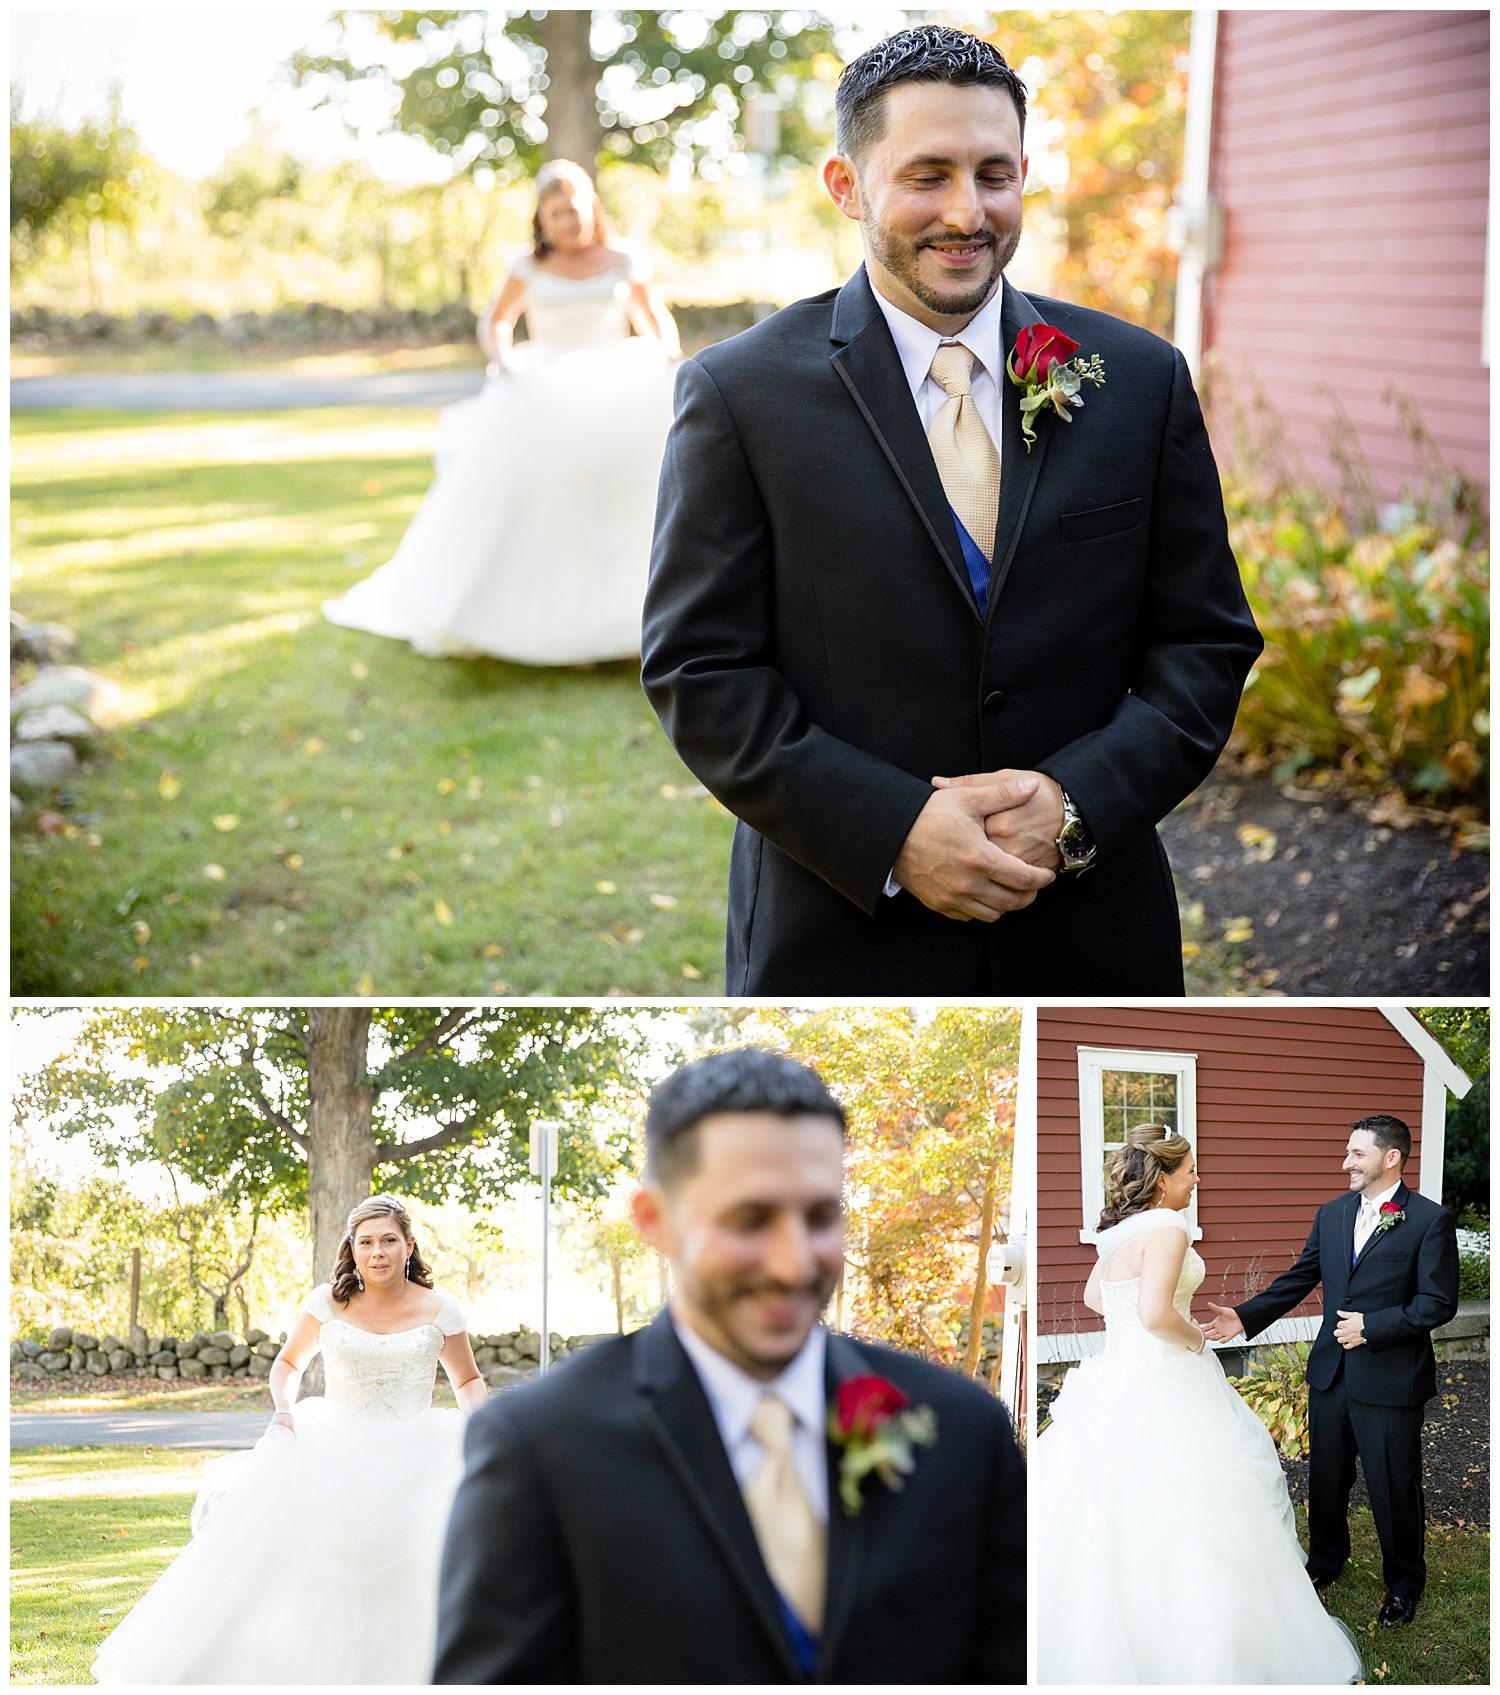 smith-barn-brooksby-farm-wedding-26-north-studios-boston-wedding-photographer-011.jpg